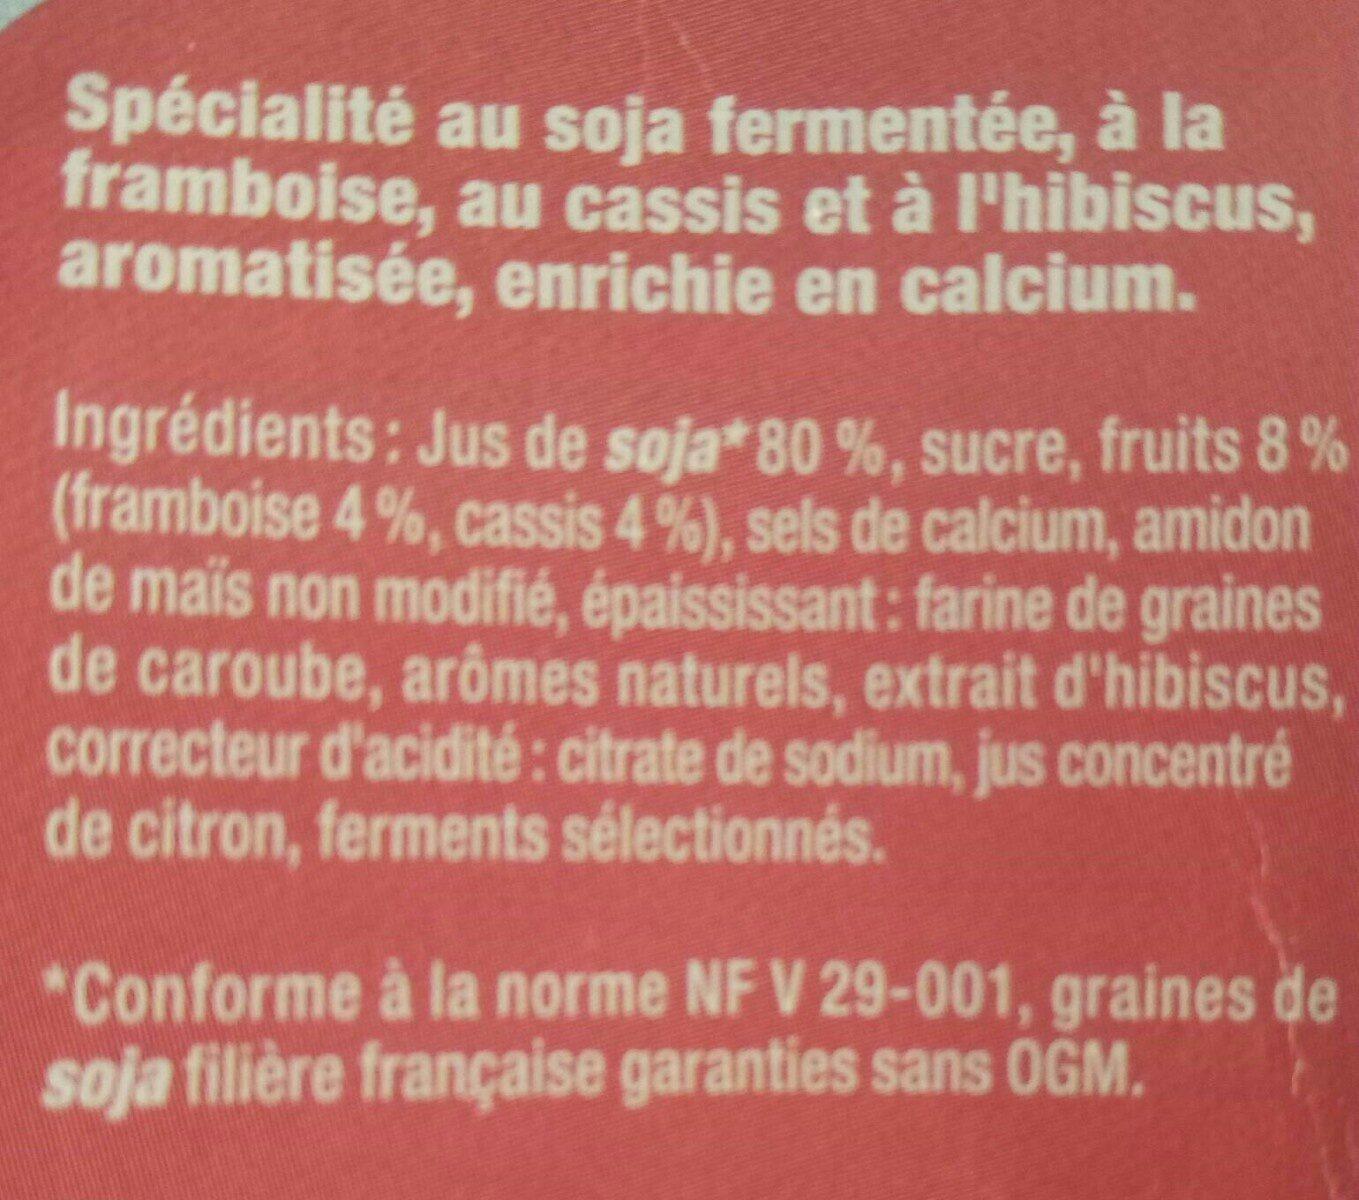 Framboise-cassis-hibiscus - Ingredients